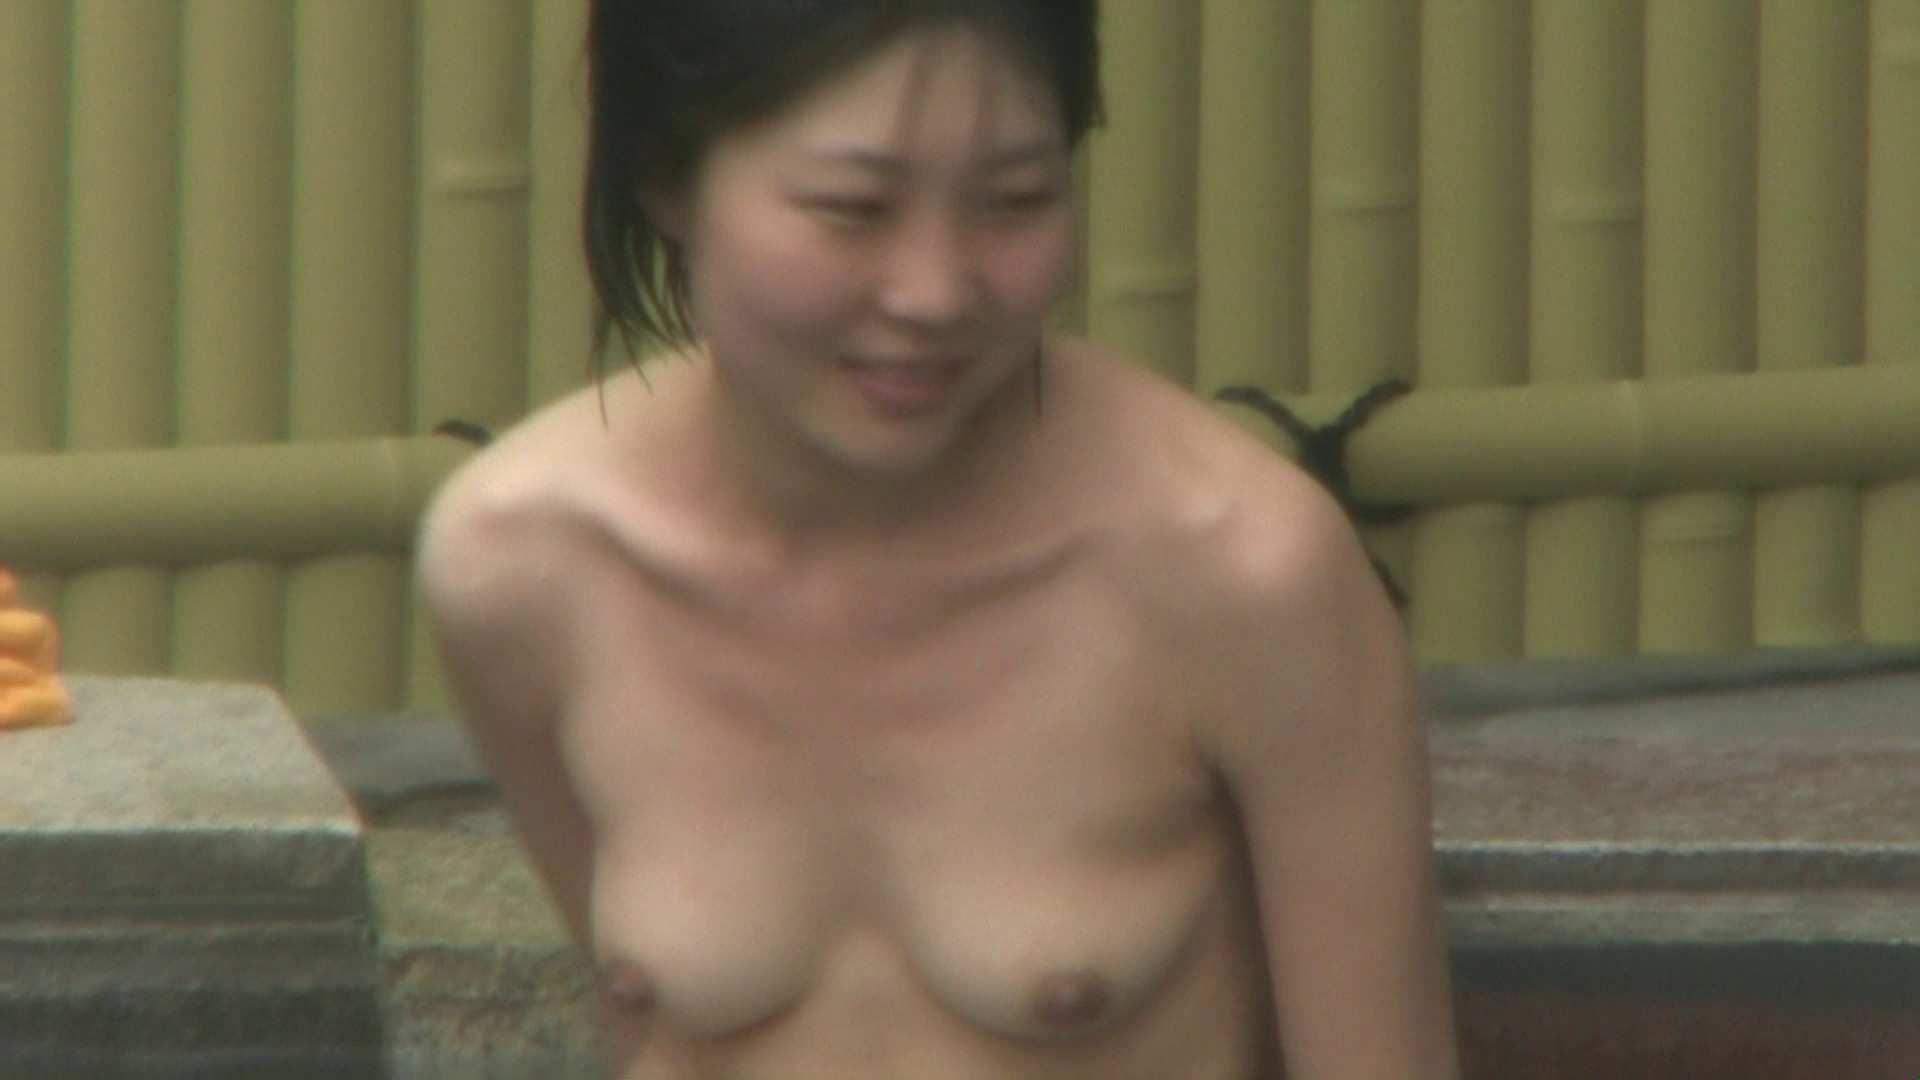 Aquaな露天風呂Vol.75【VIP限定】 盗撮特撮  10pic 3